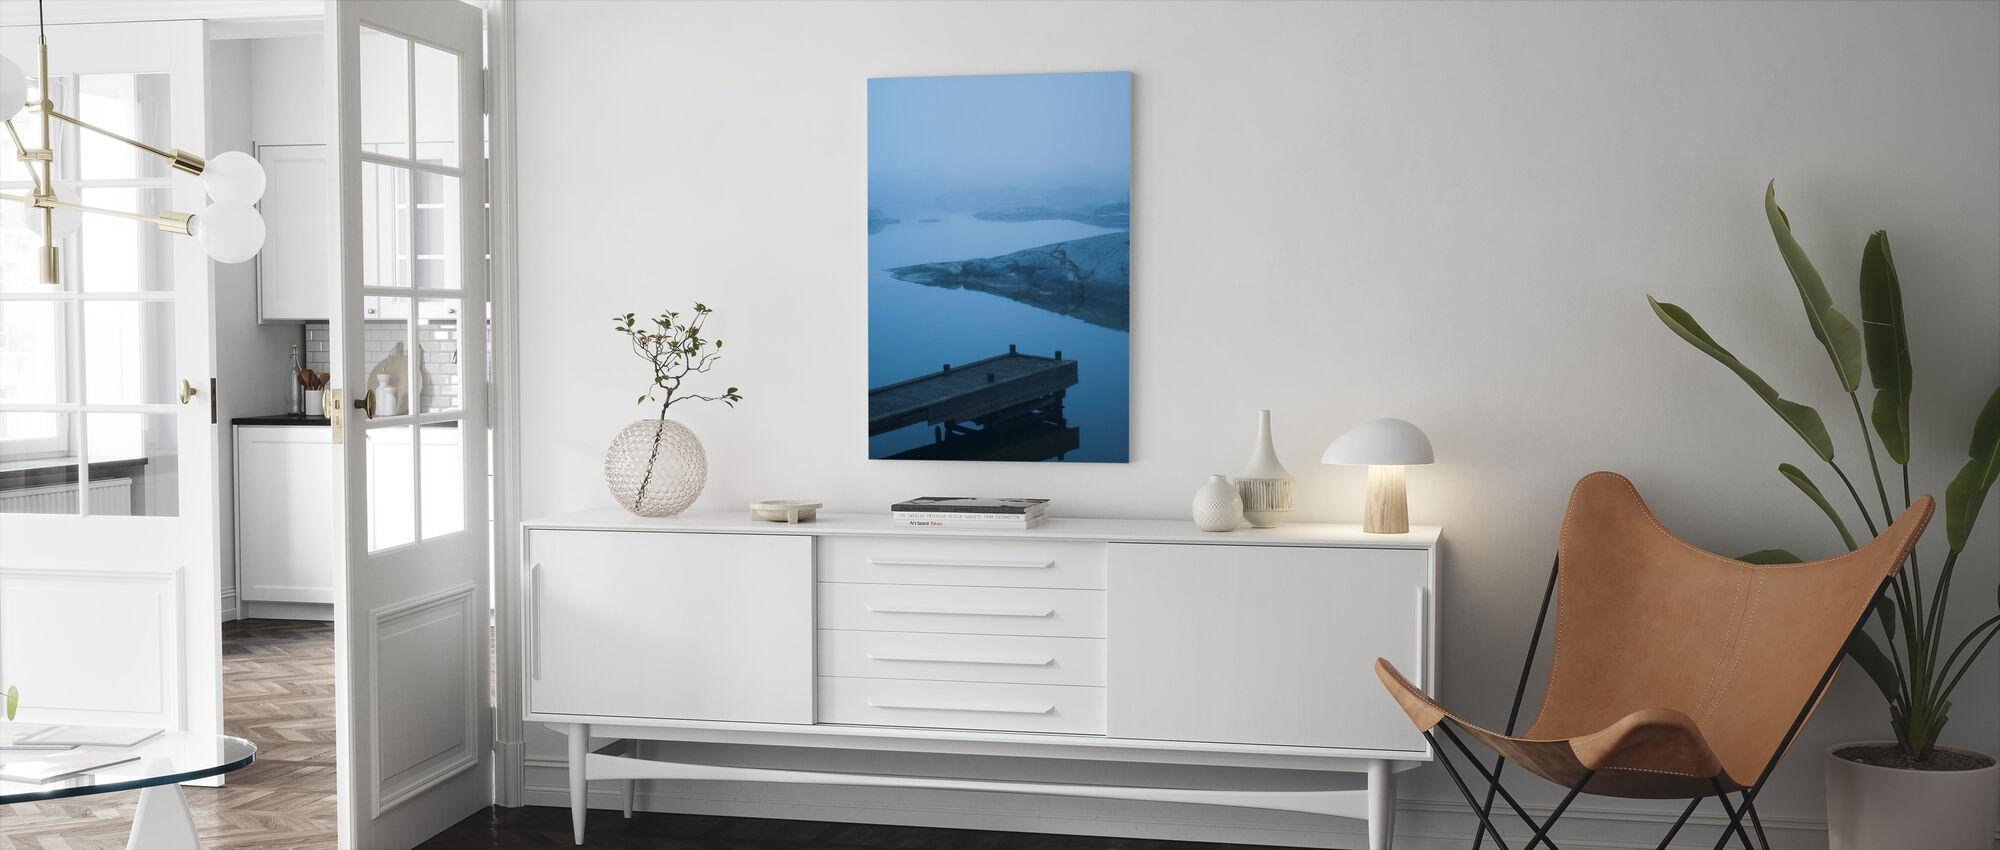 Blue Boardwalk in Uppland, Sweden, Europe - Canvas print - Living Room